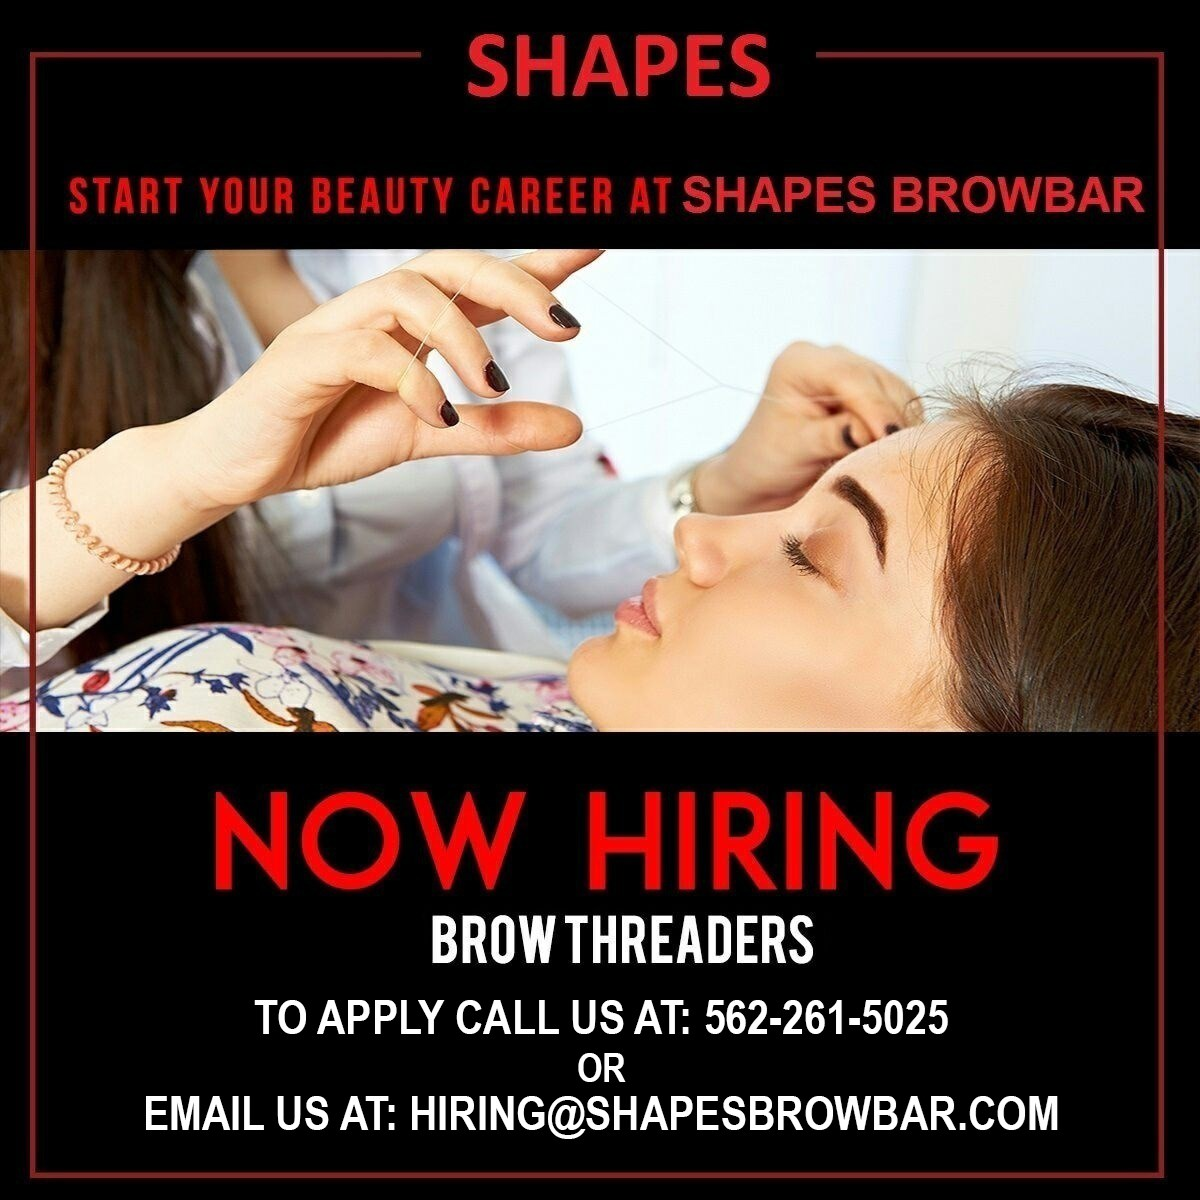 Eyebrow Threading Specialist Job In Chandler Az By Shapes Brow Bar